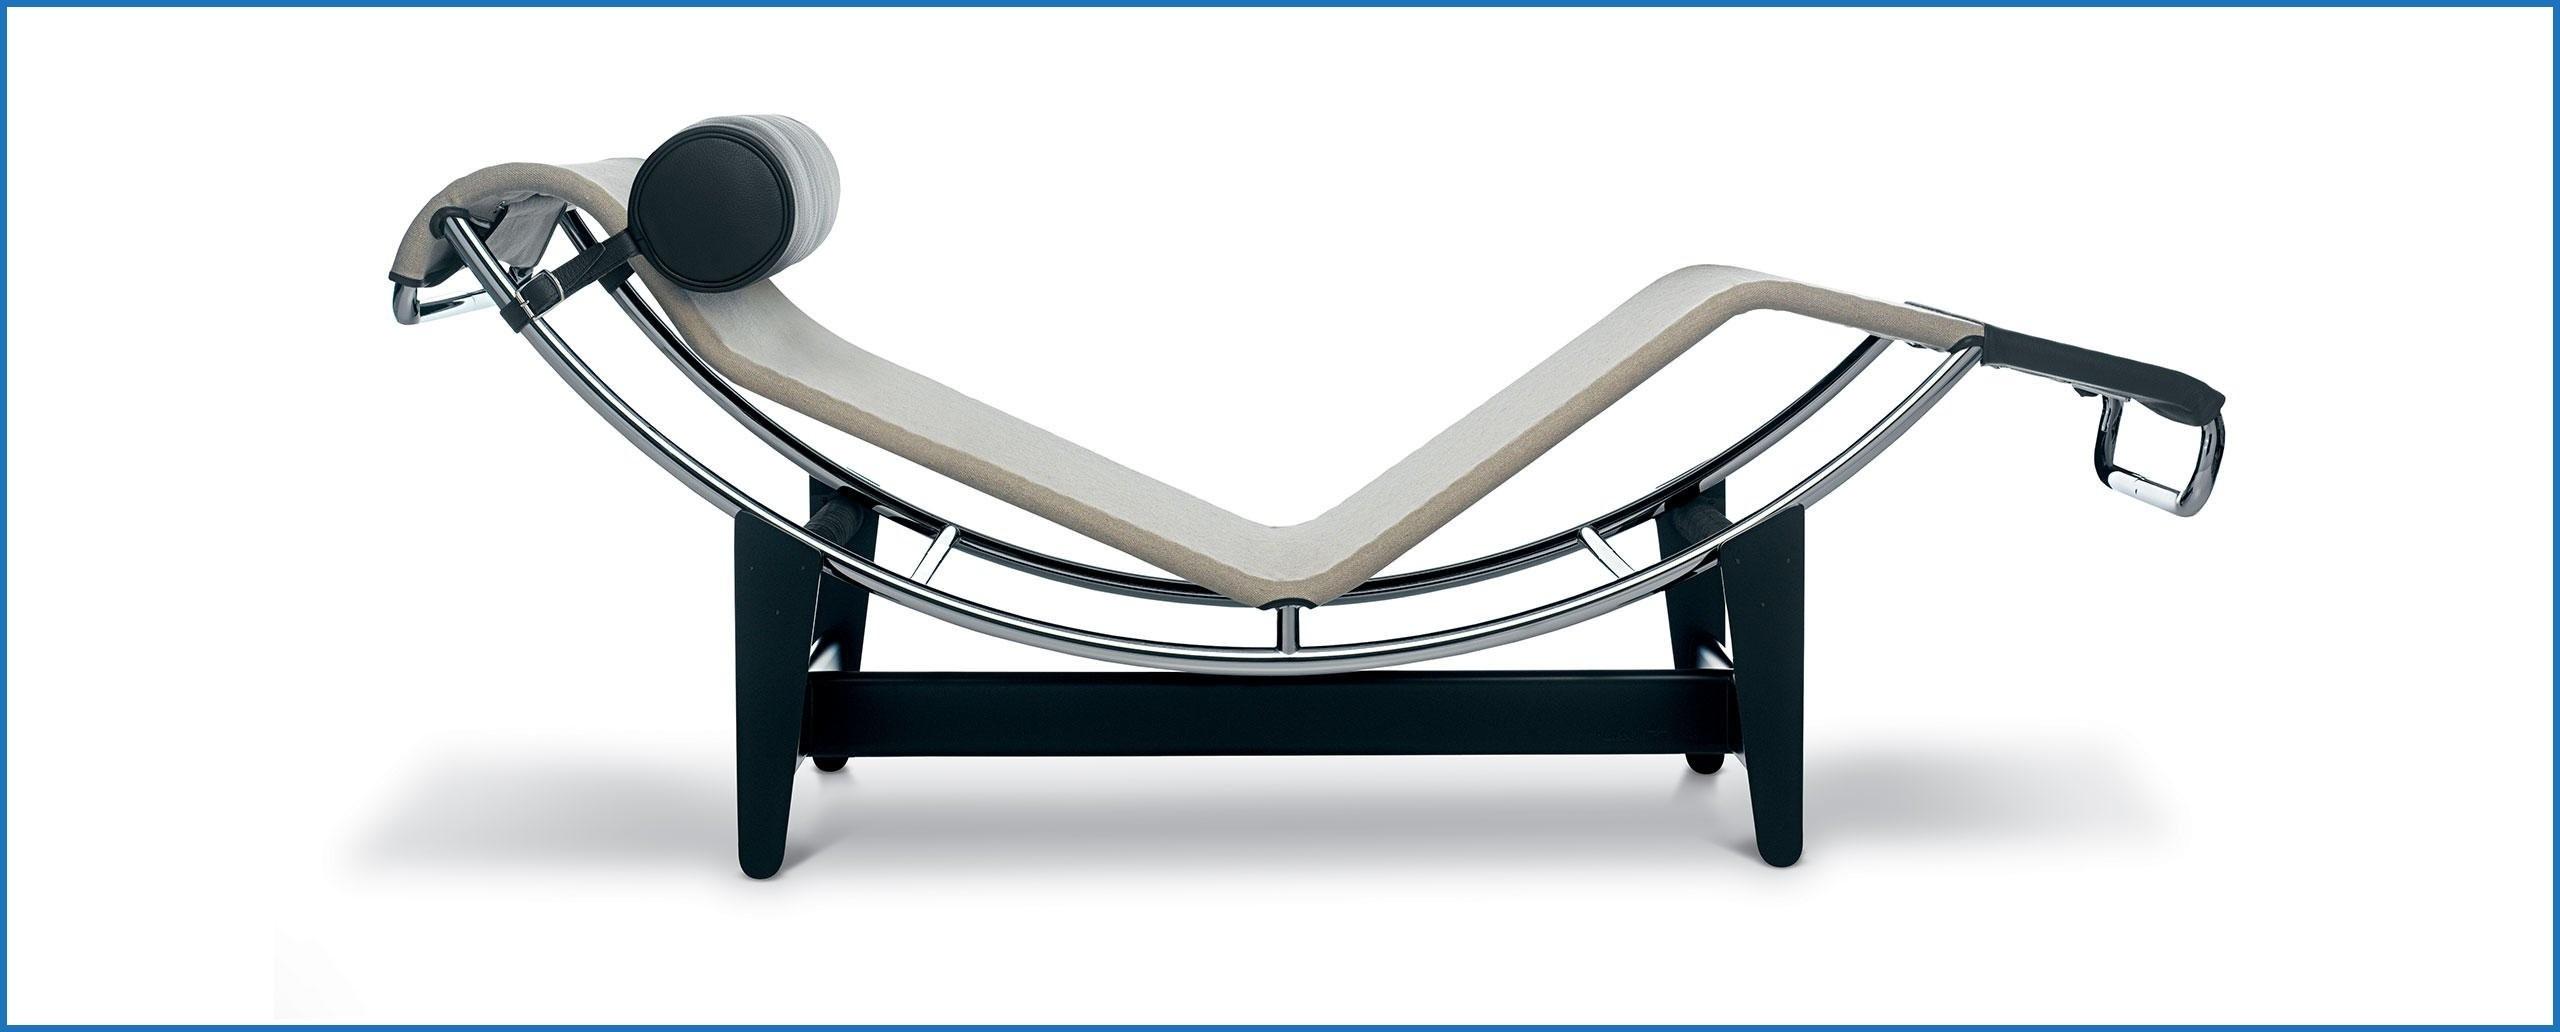 Meilleur Chaise Longue Lc4 Stock De Chaise Accessoires 11844 Within Preferred Le Corbusier Chaises (View 9 of 15)